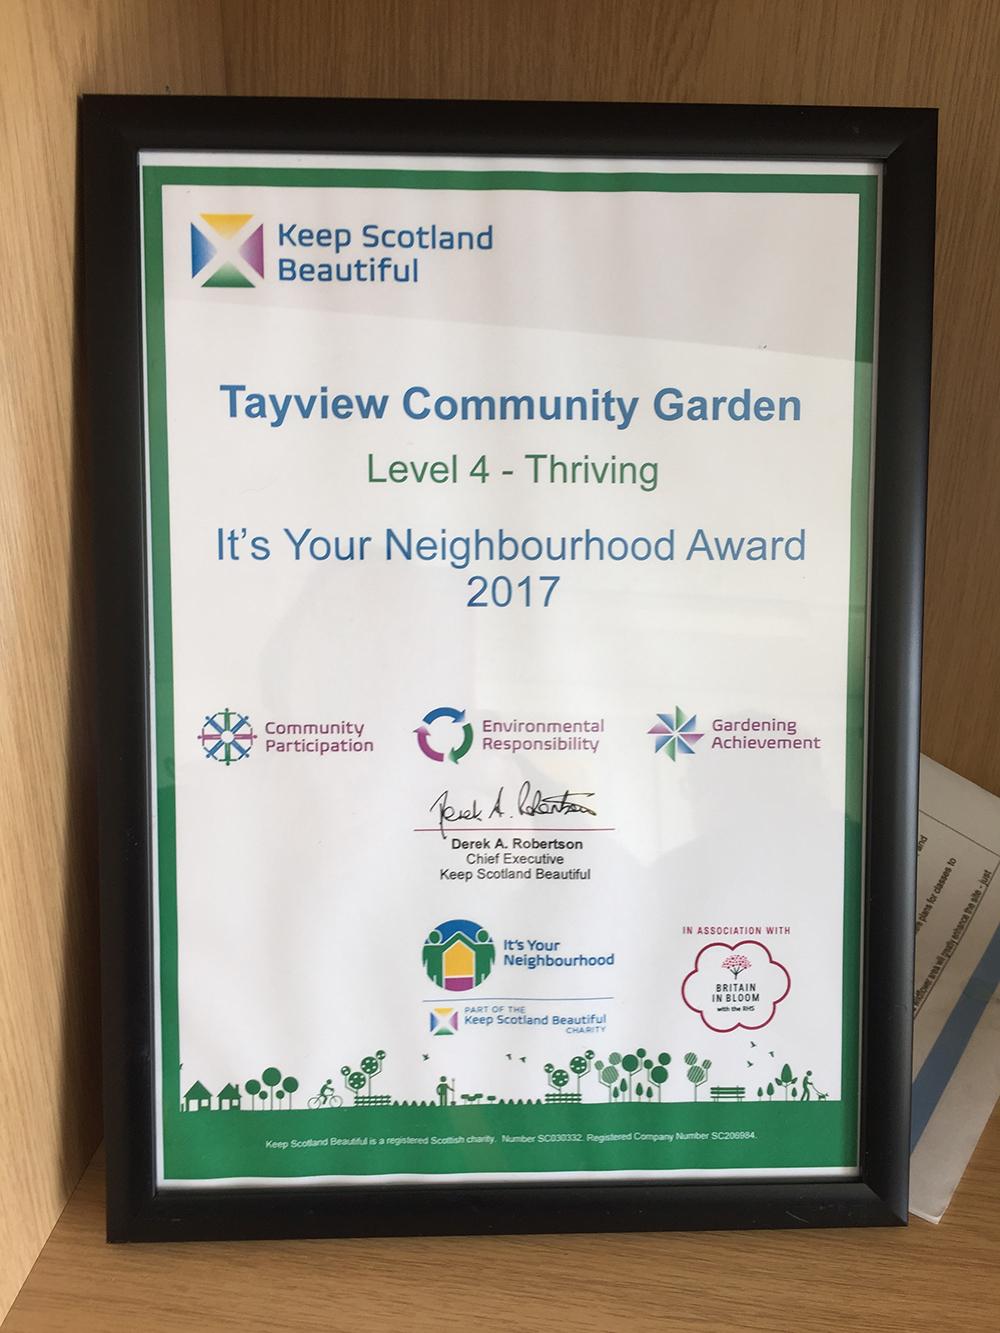 tayview community garden